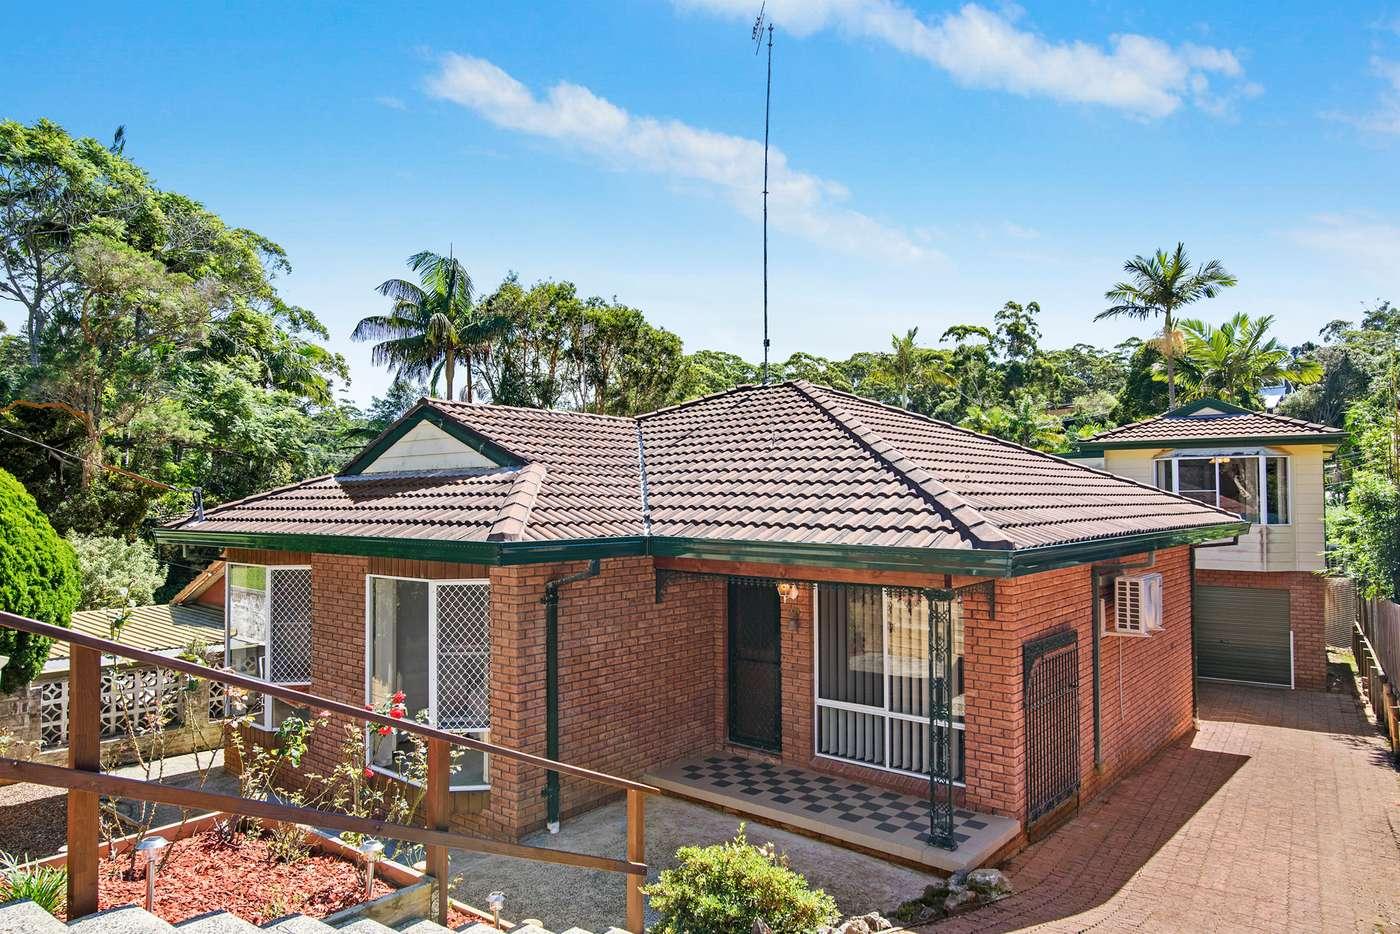 Main view of Homely house listing, 29 Branga Avenue, Copacabana NSW 2251